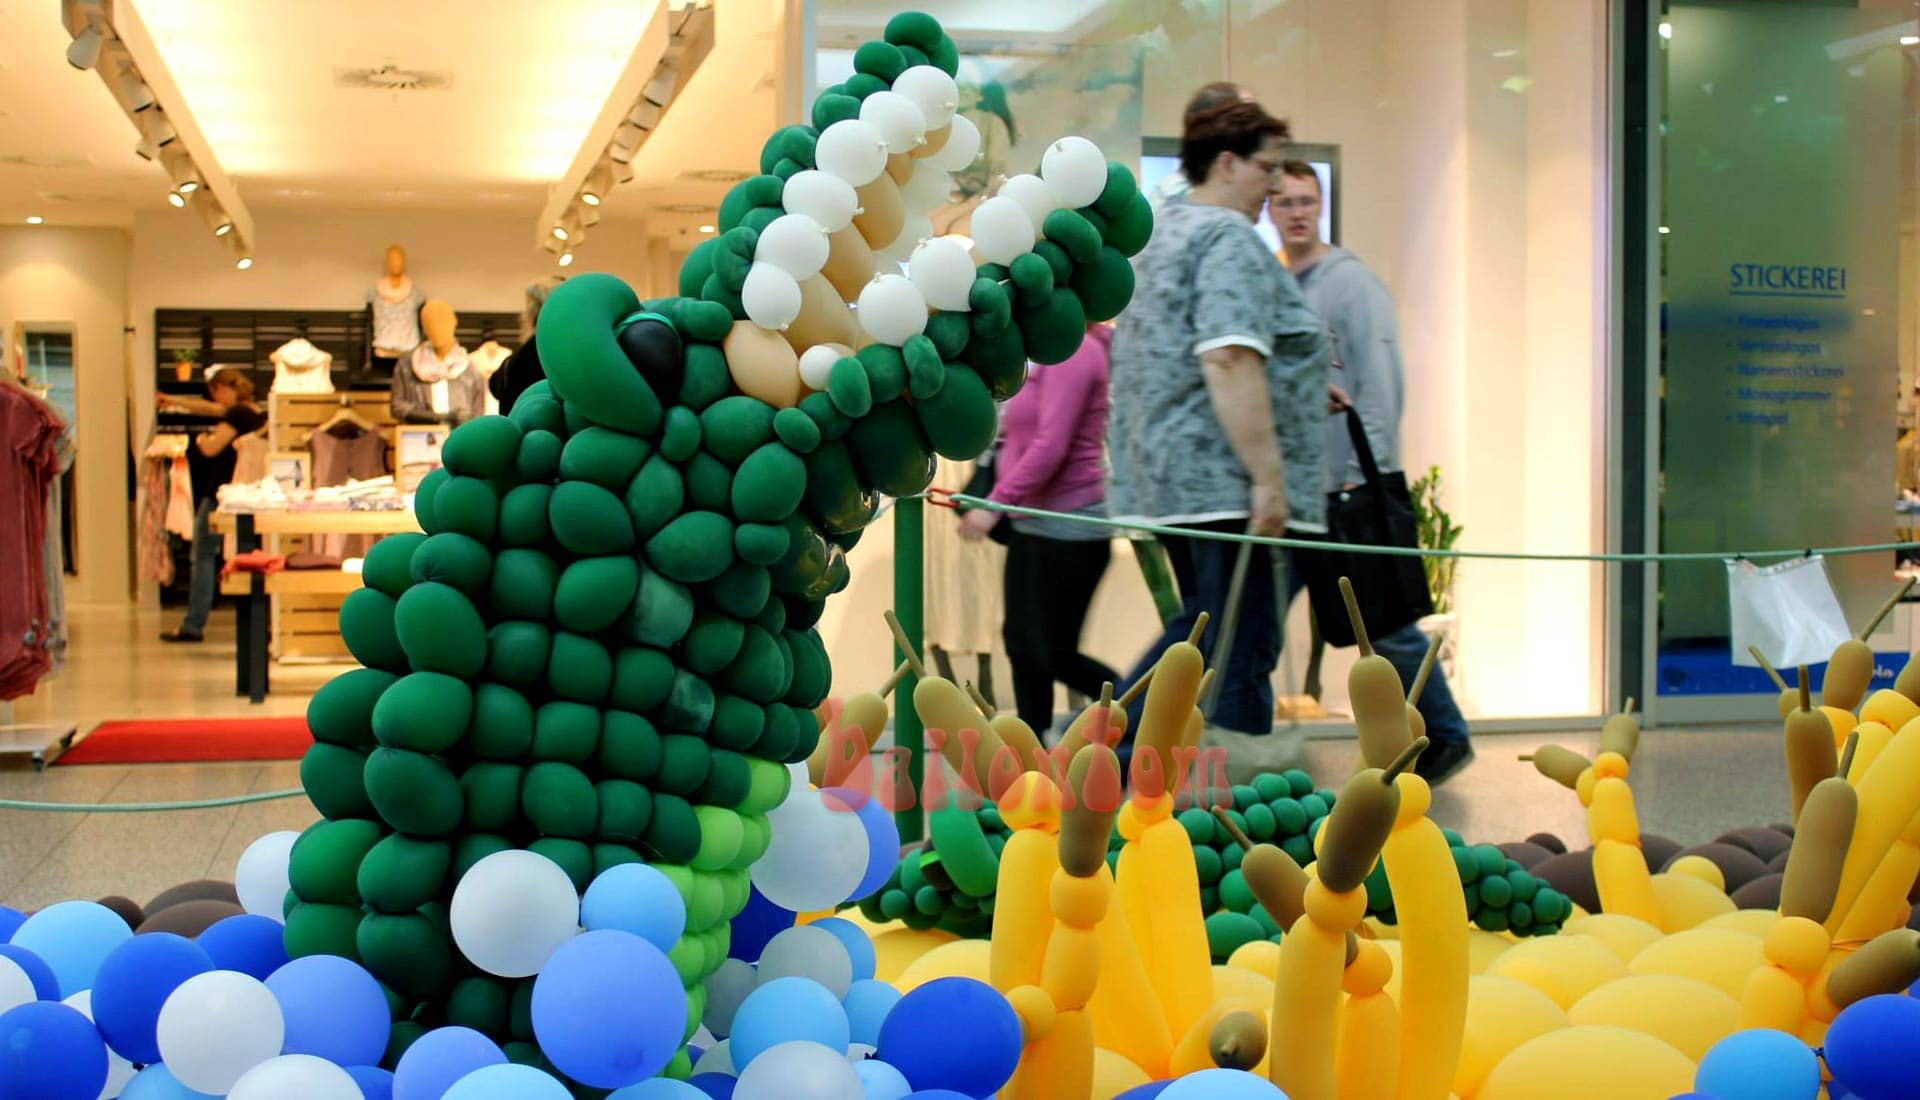 Ballonwelt im Rathauscenter Pankow in Berlin - Moto: Auf Safarie in Pankow - Bild: Krokodil